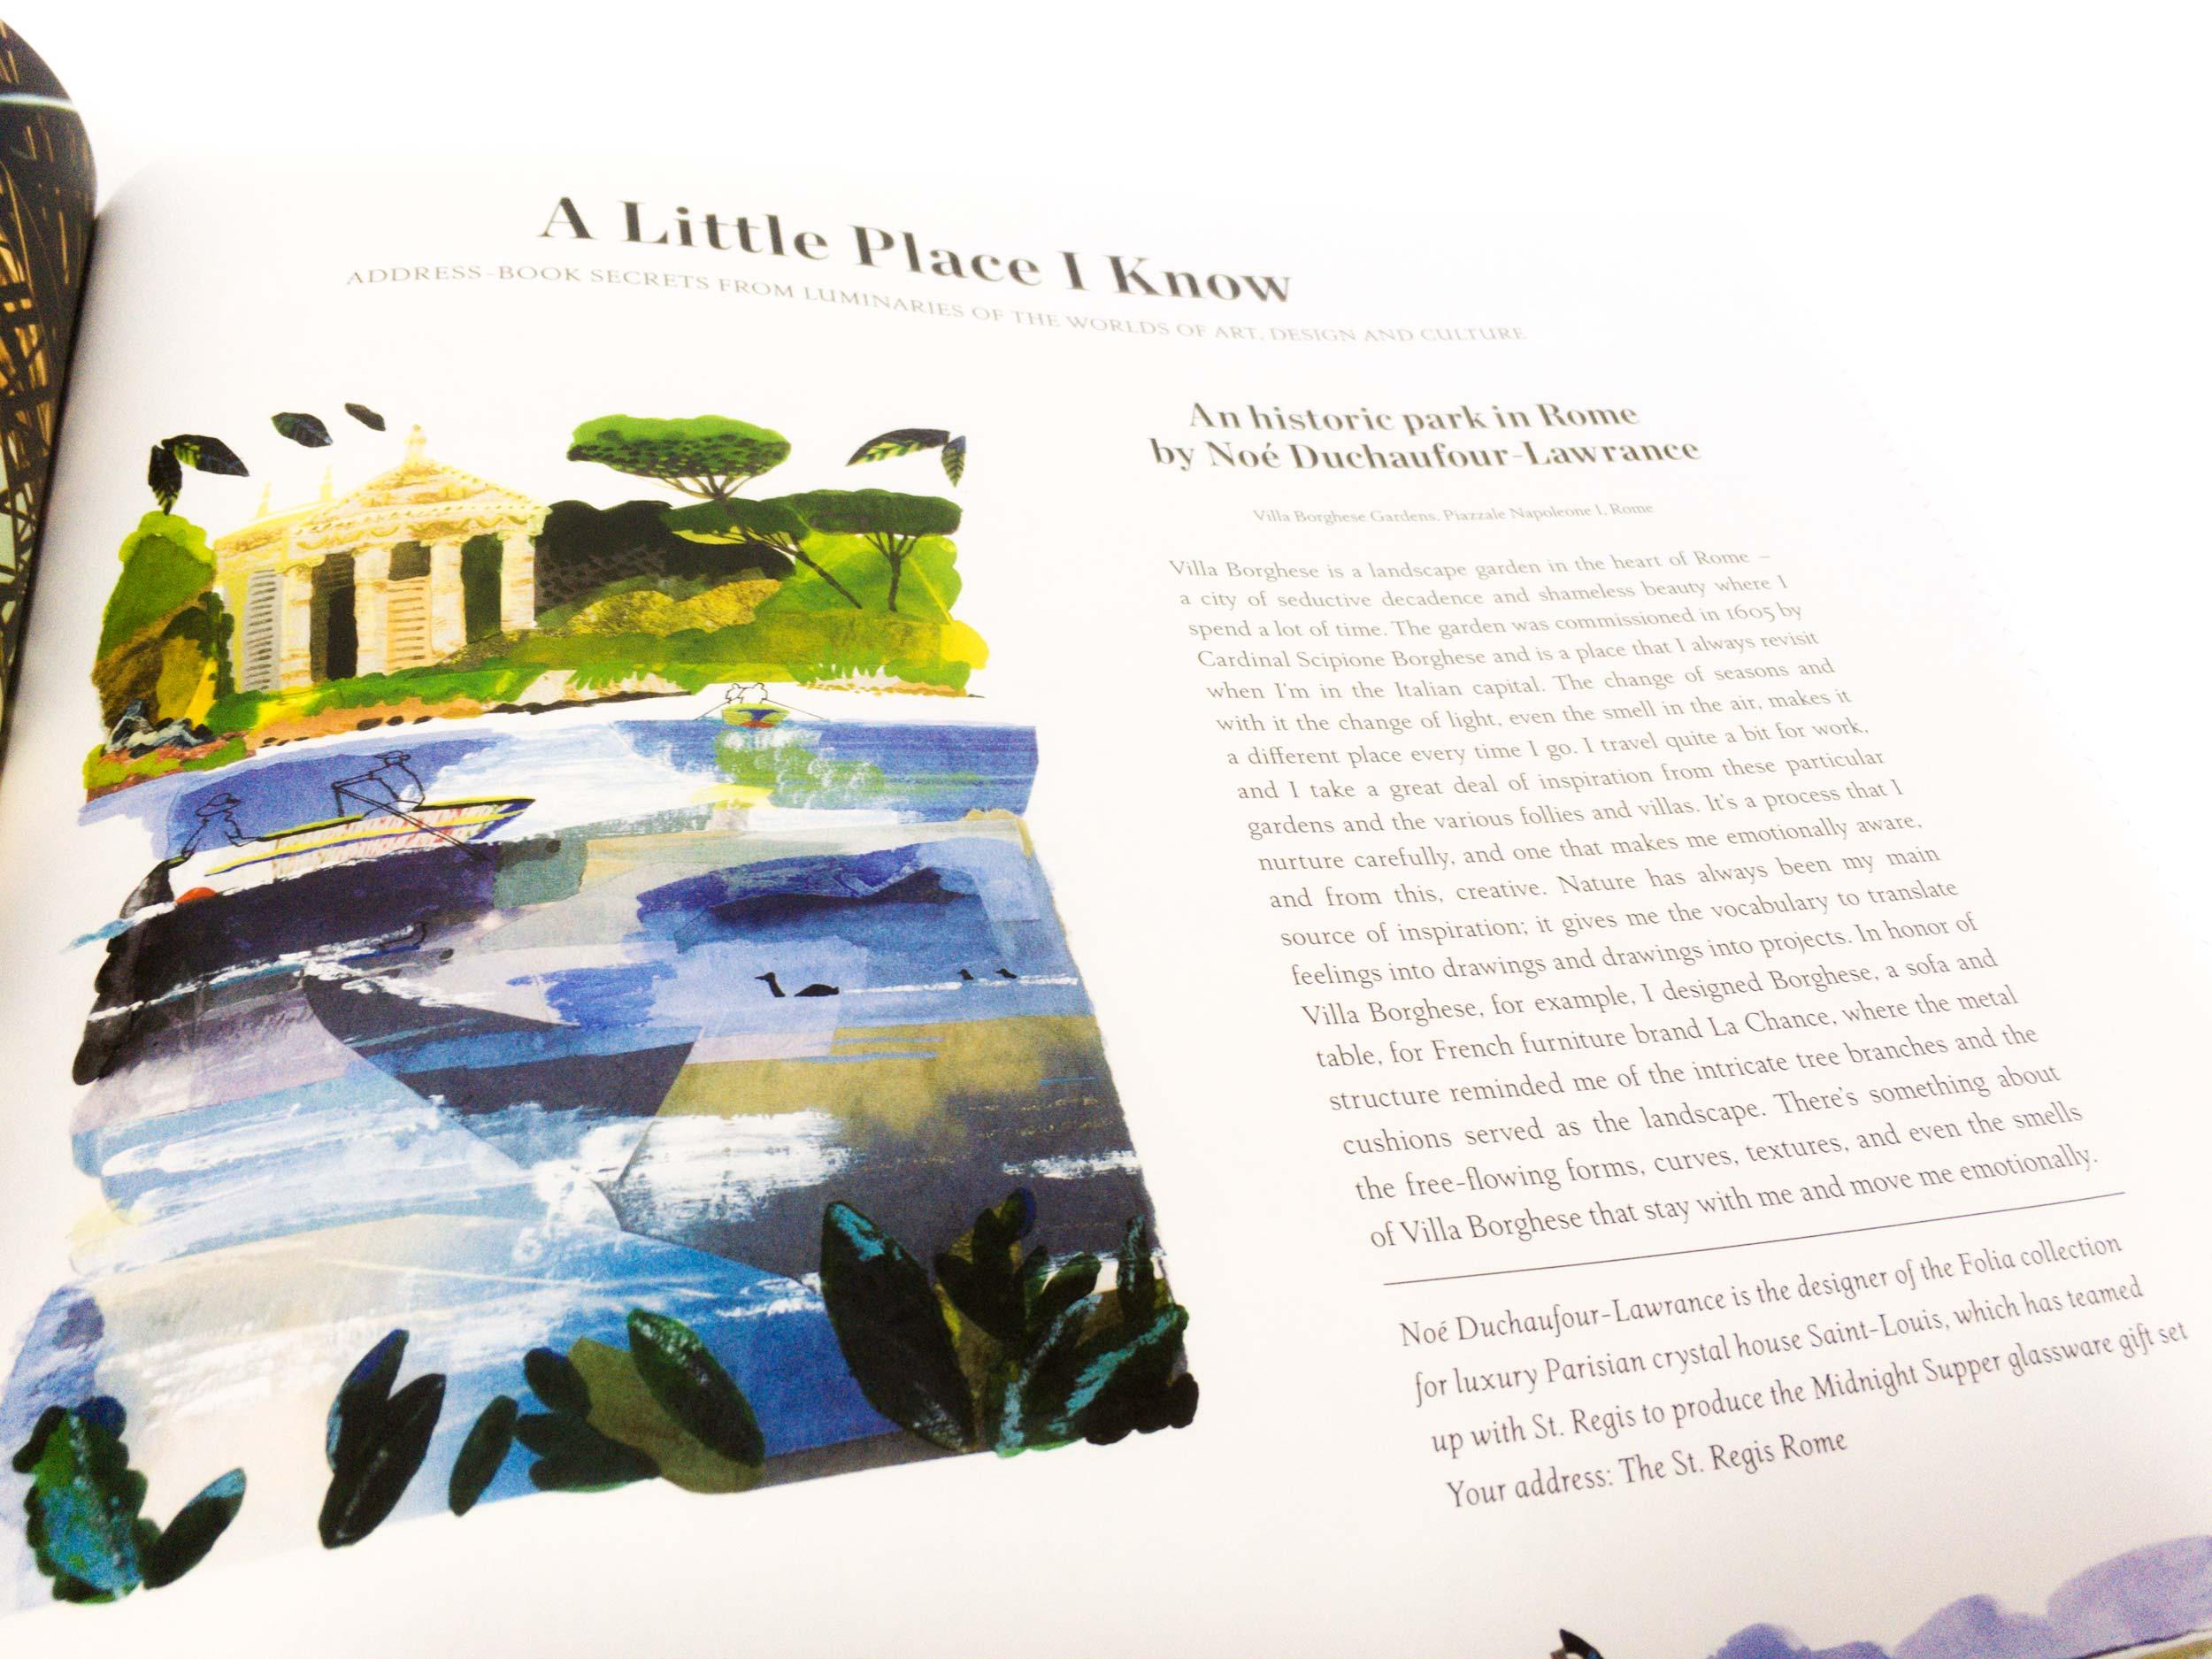 St Regis Beyond illustrations by James Oses, image 2